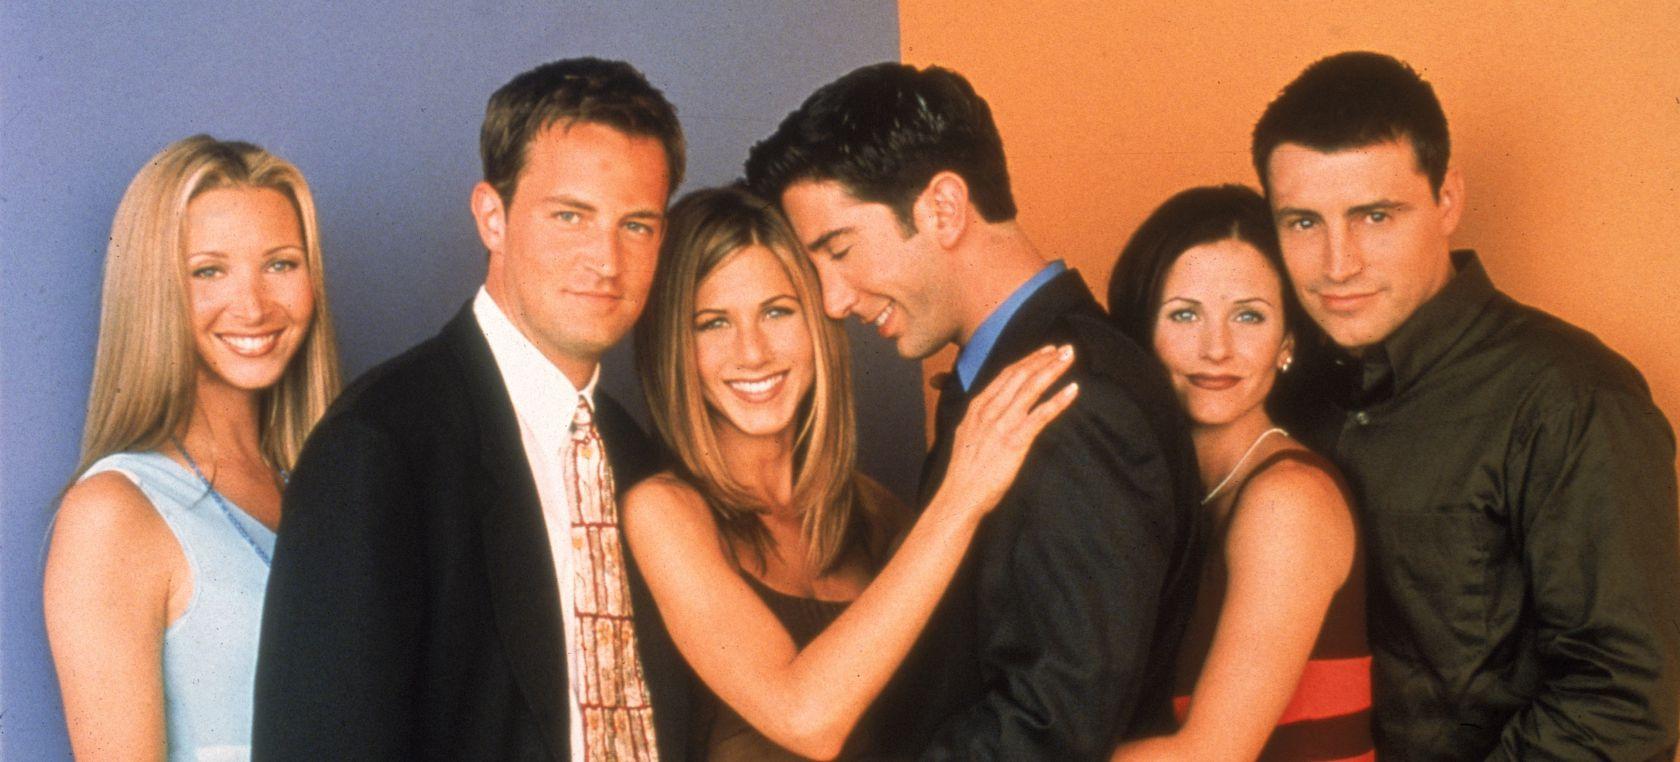 El reparto de 'Friends' se emociona mientras canta 'I'll be there for you'